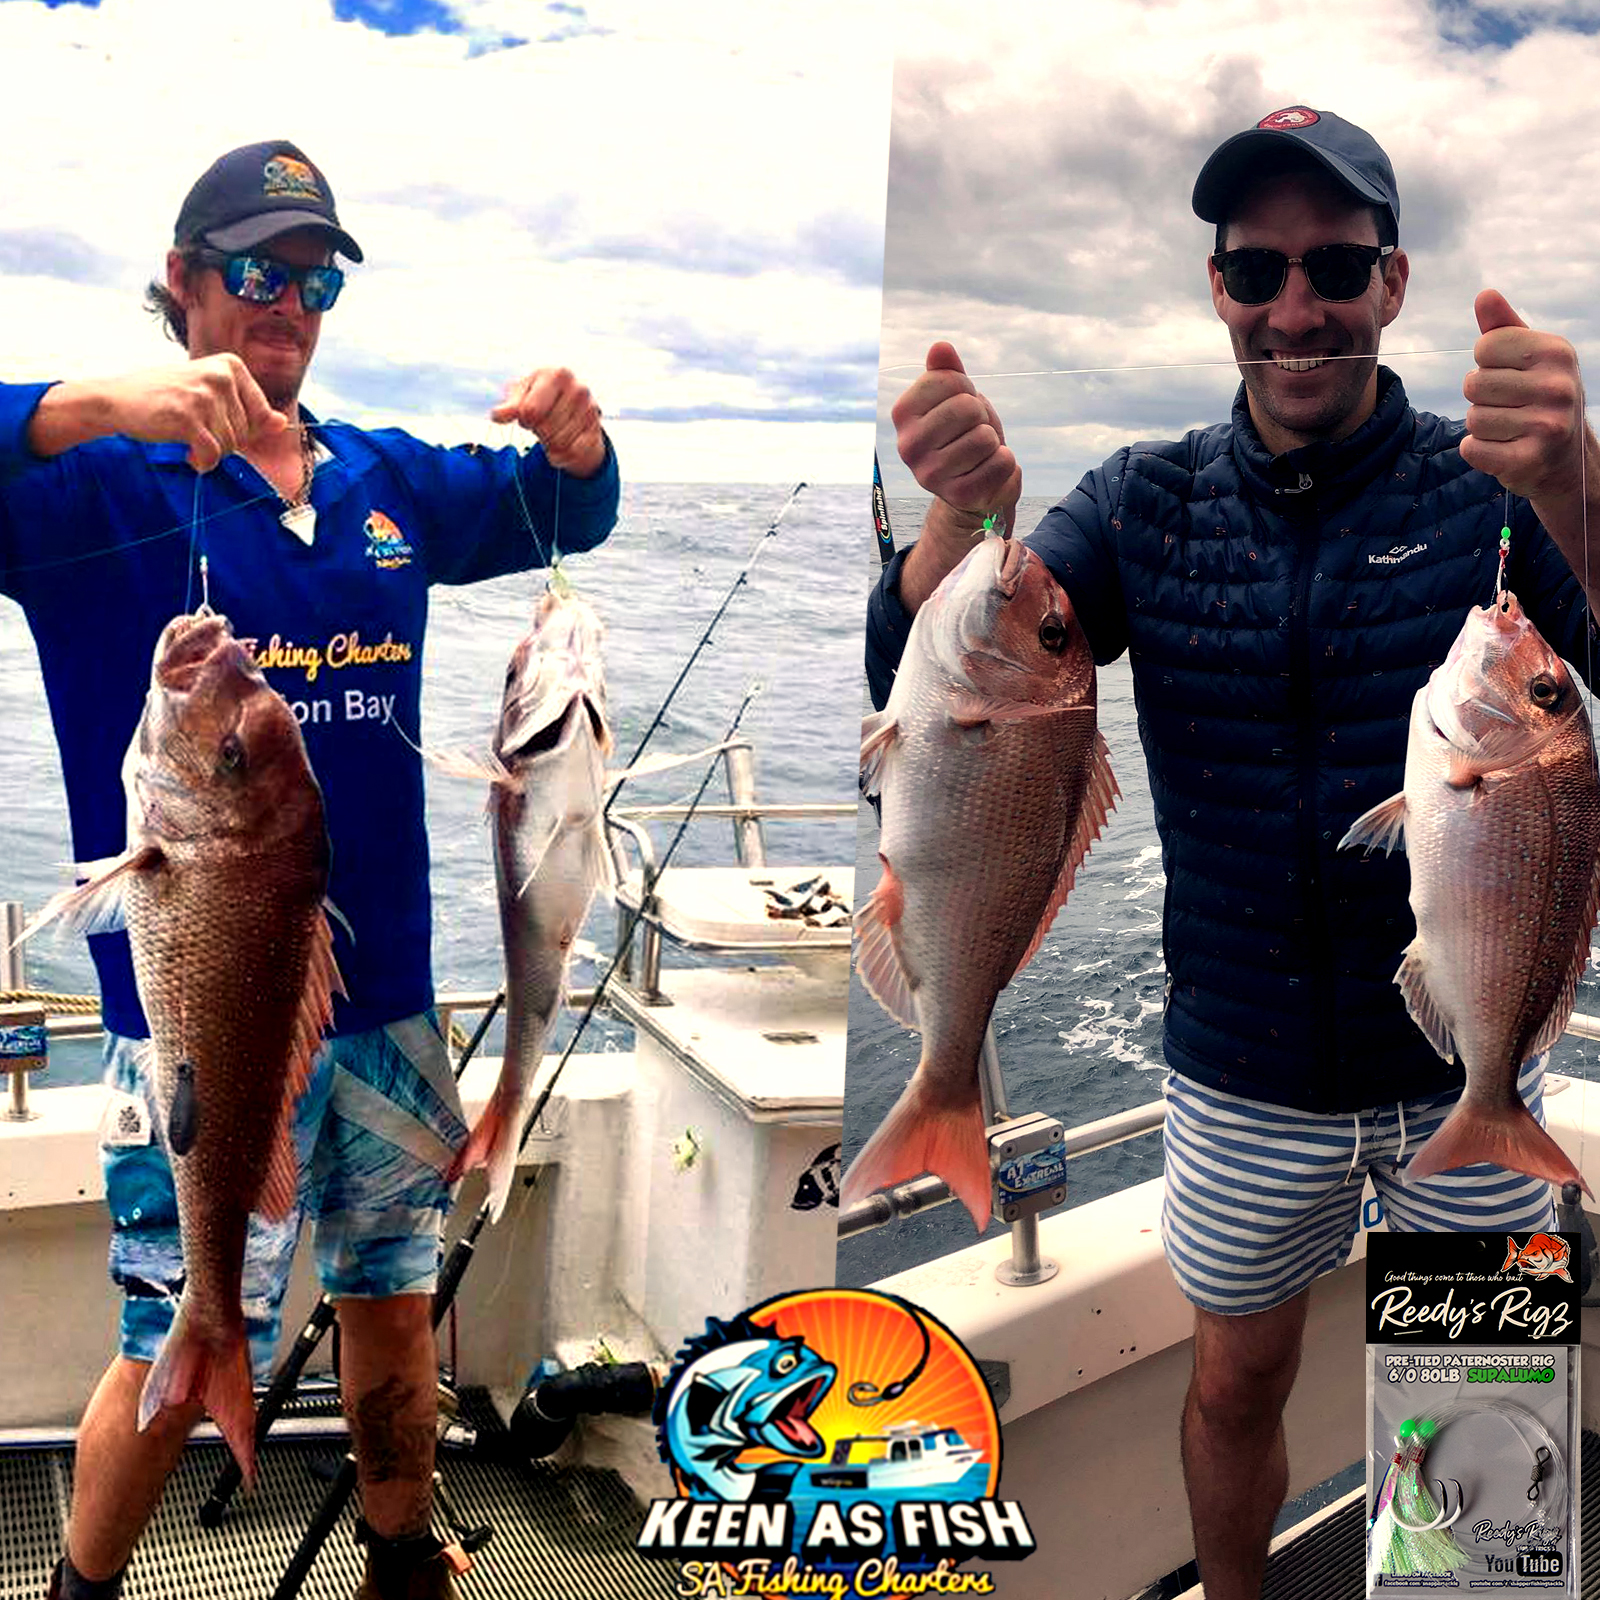 Snapper charter South Australia, reedys rigz, snapper fishing